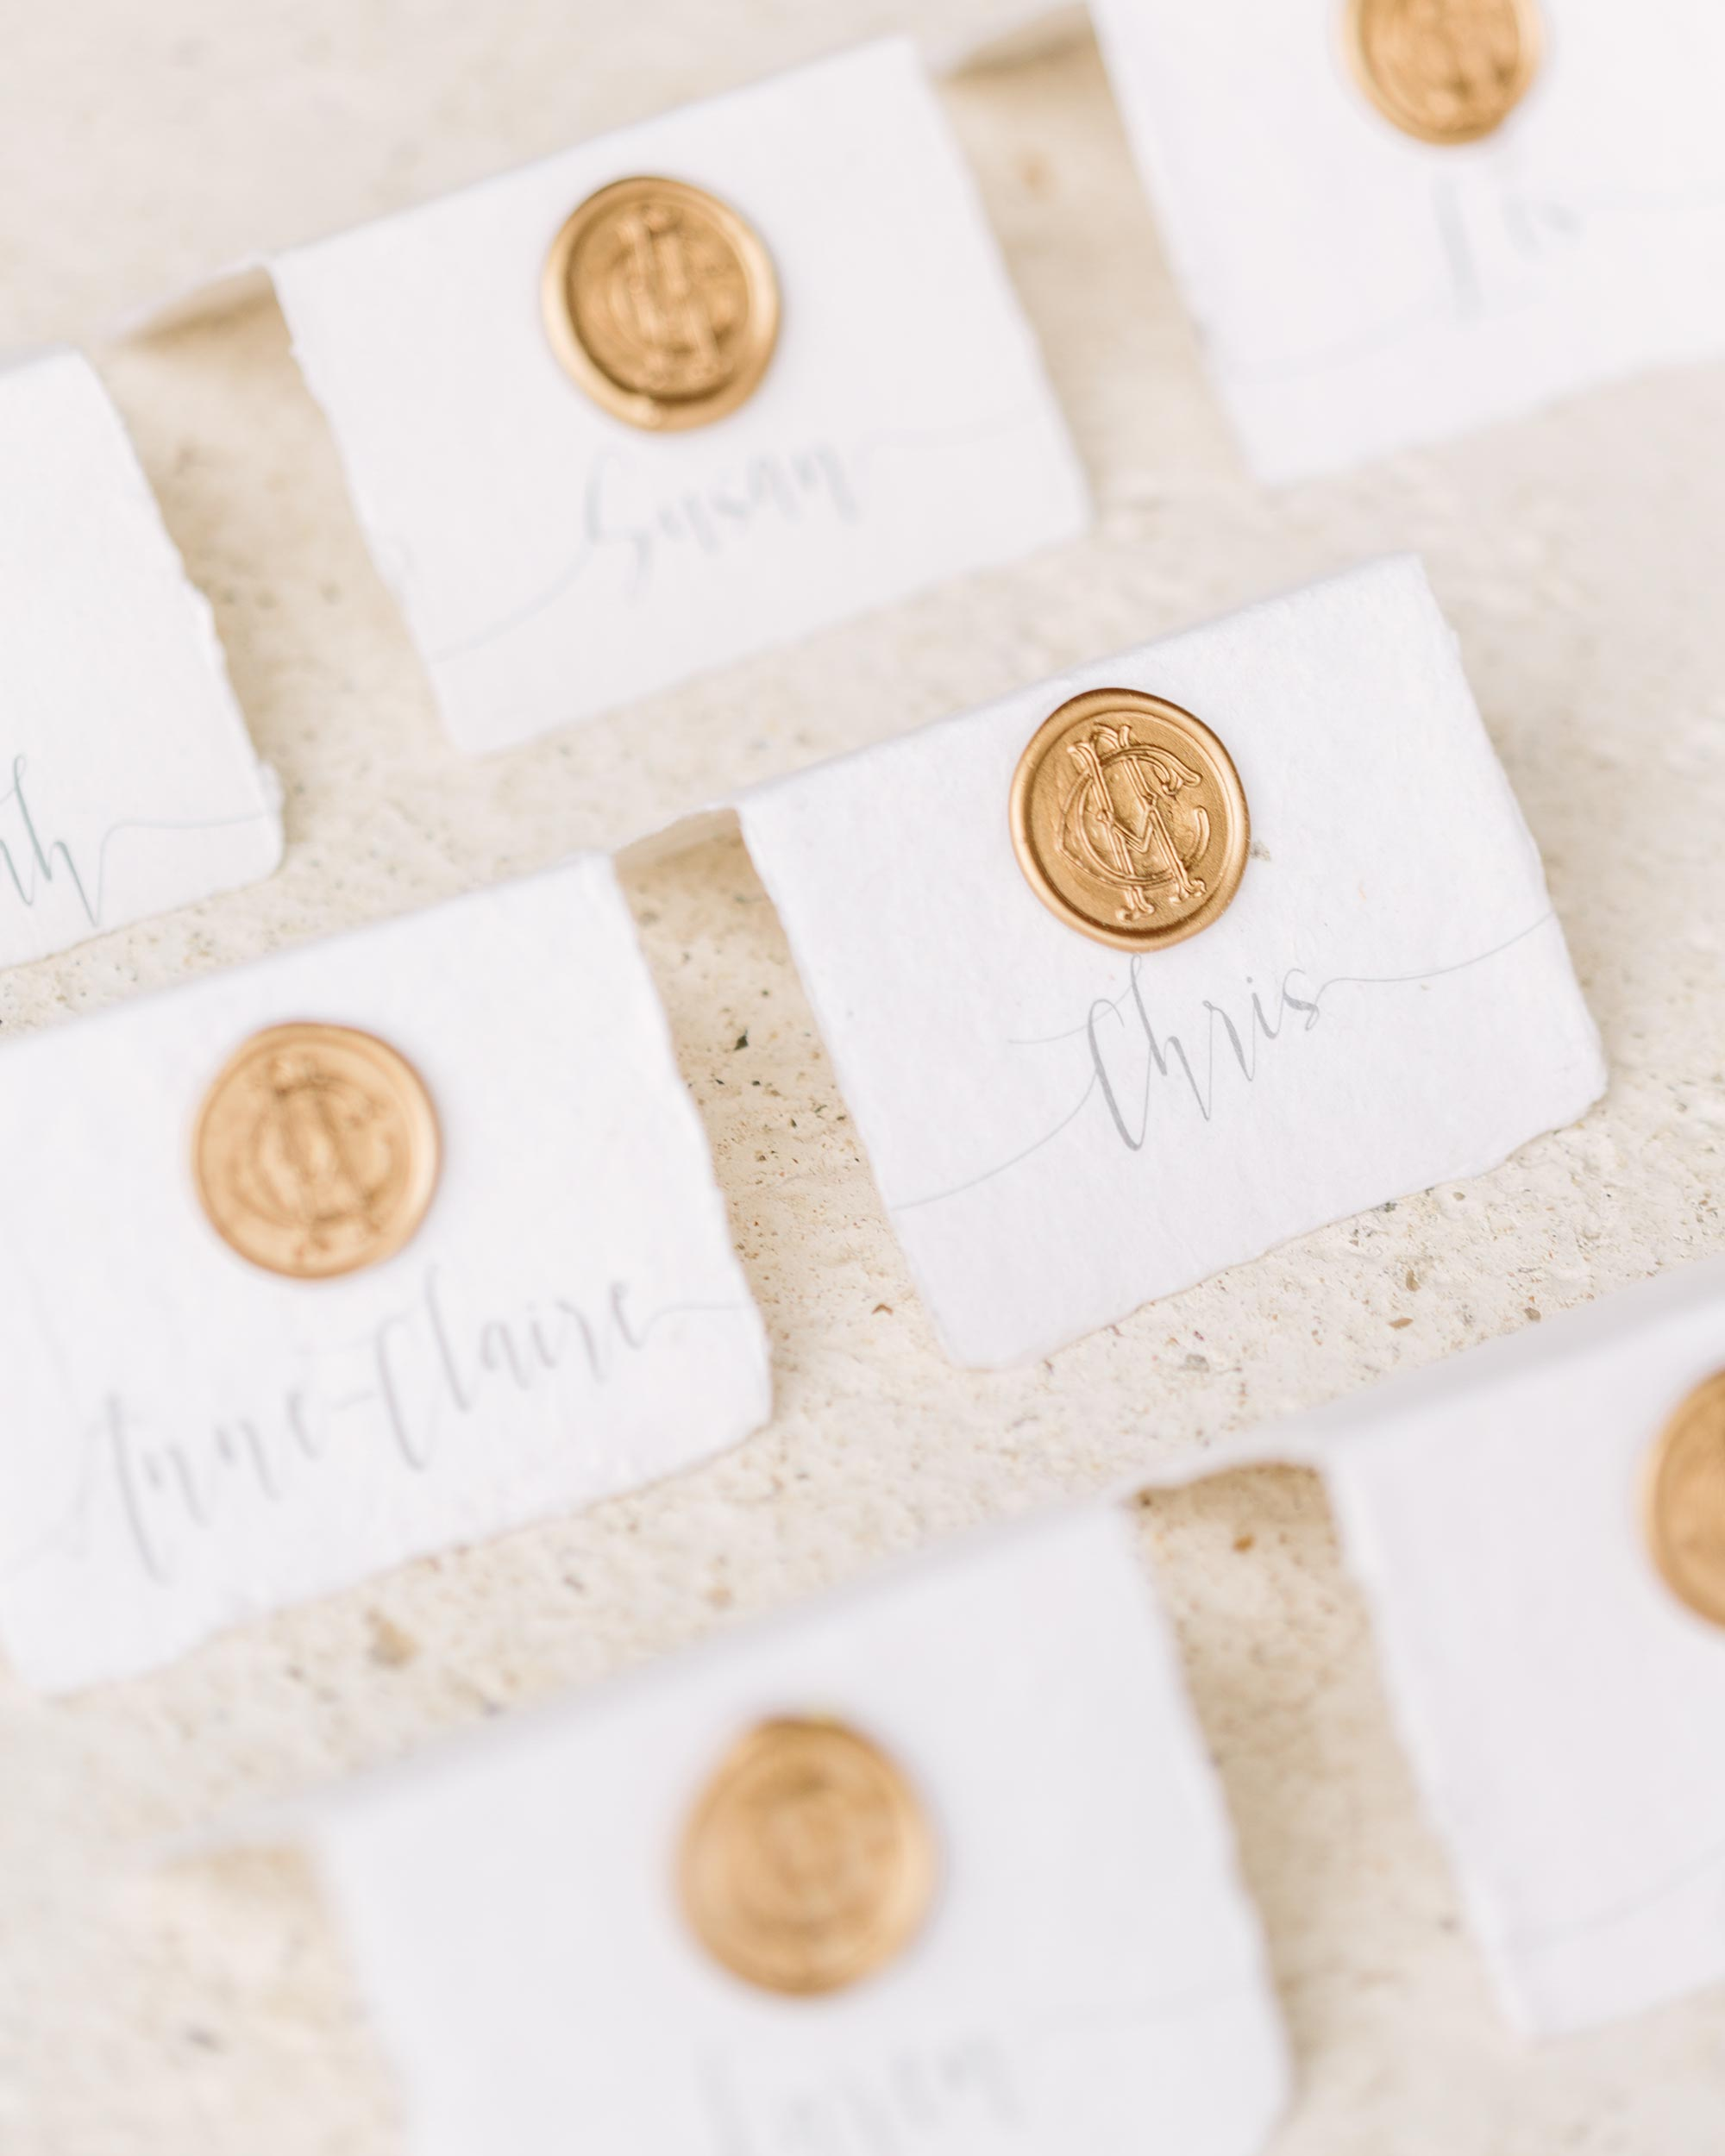 anneclaire-chris-wedding-france-escortcards-060-s113034-00716.jpg